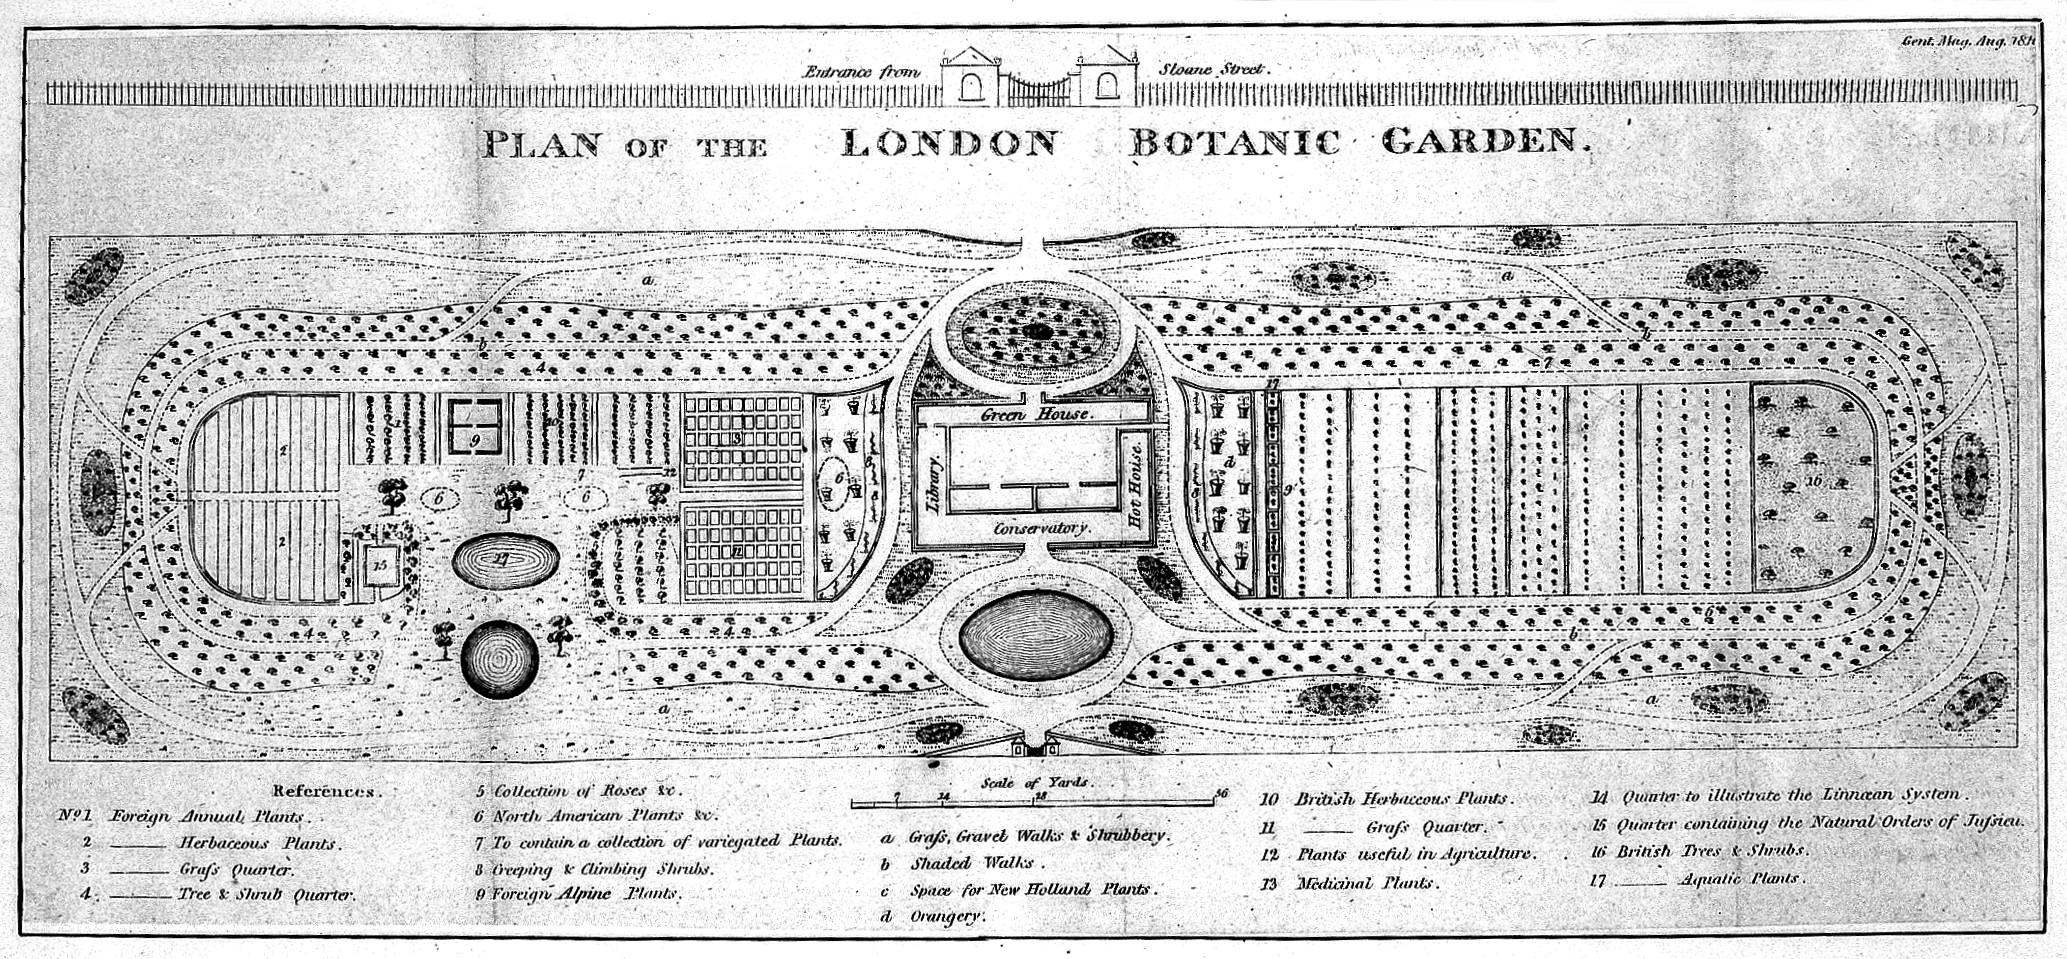 Physic garden wikipedia - File The Physic Garden Chelsea A Plan View With A Key Describin Wellcome